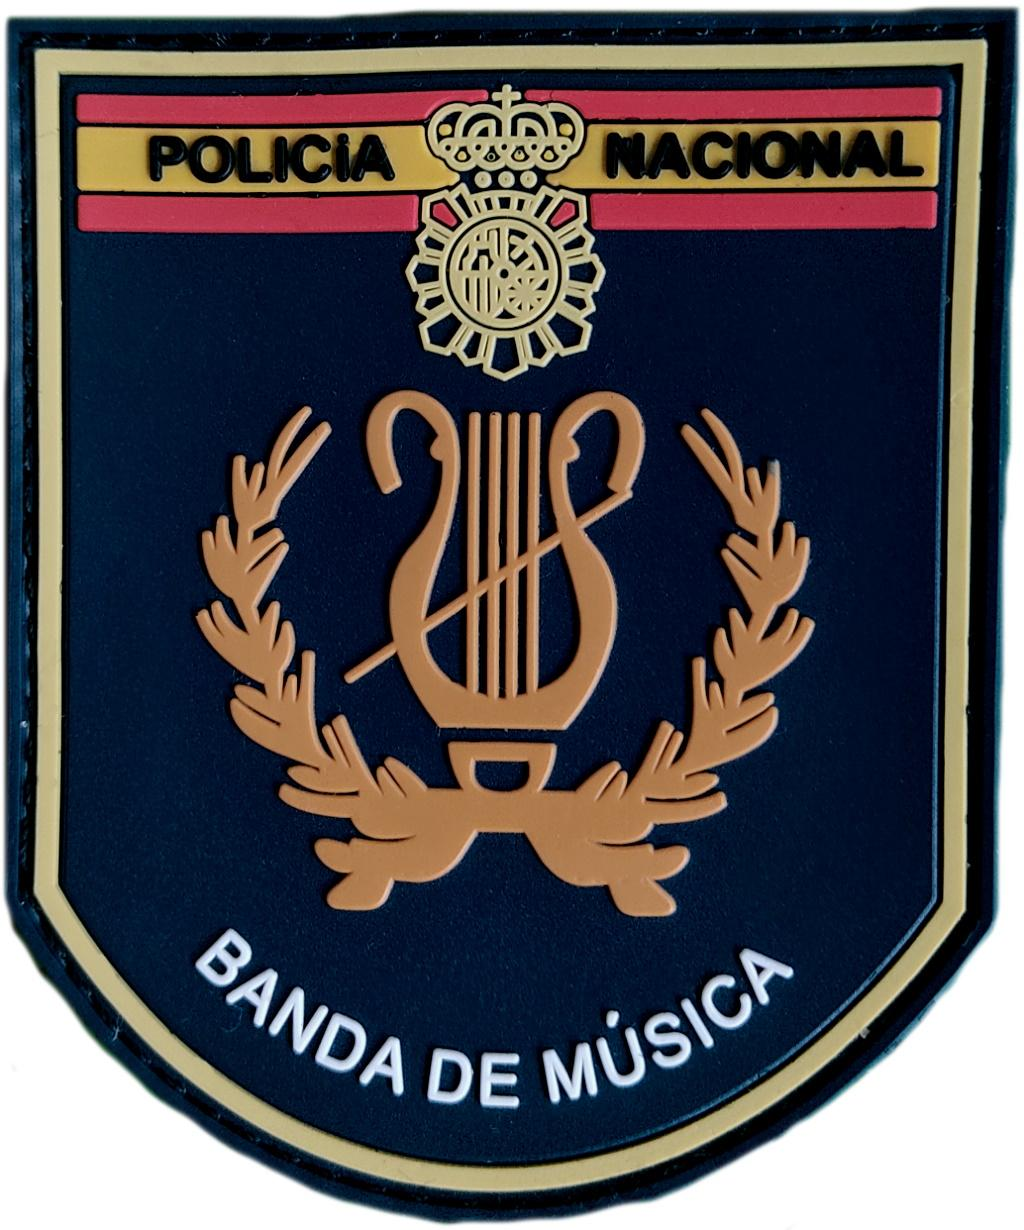 Policía Nacional CNP Banda de Música parche insignia emblema distintivo